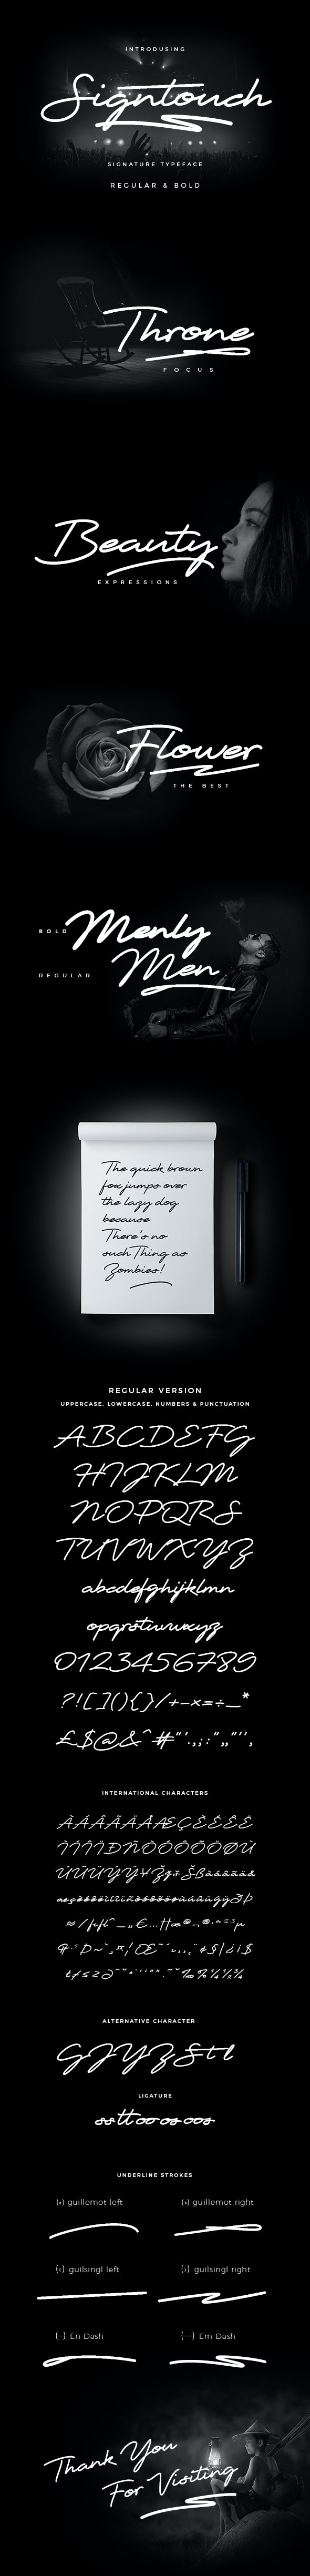 Signtouch Signature Font - Calligraphy Script